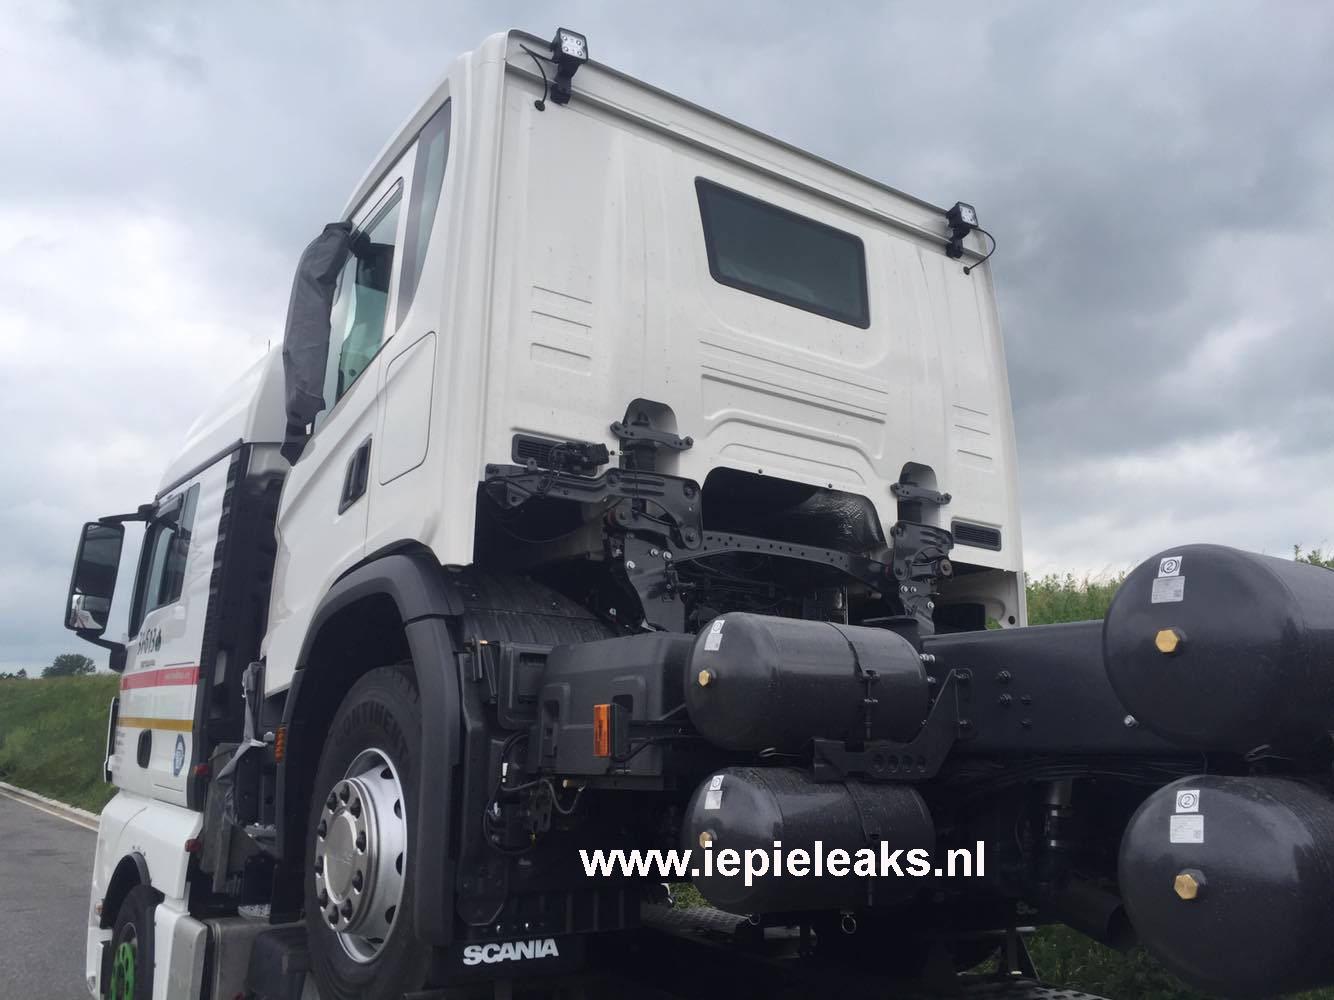 New Scania Xt Construction Range Iepieleaks